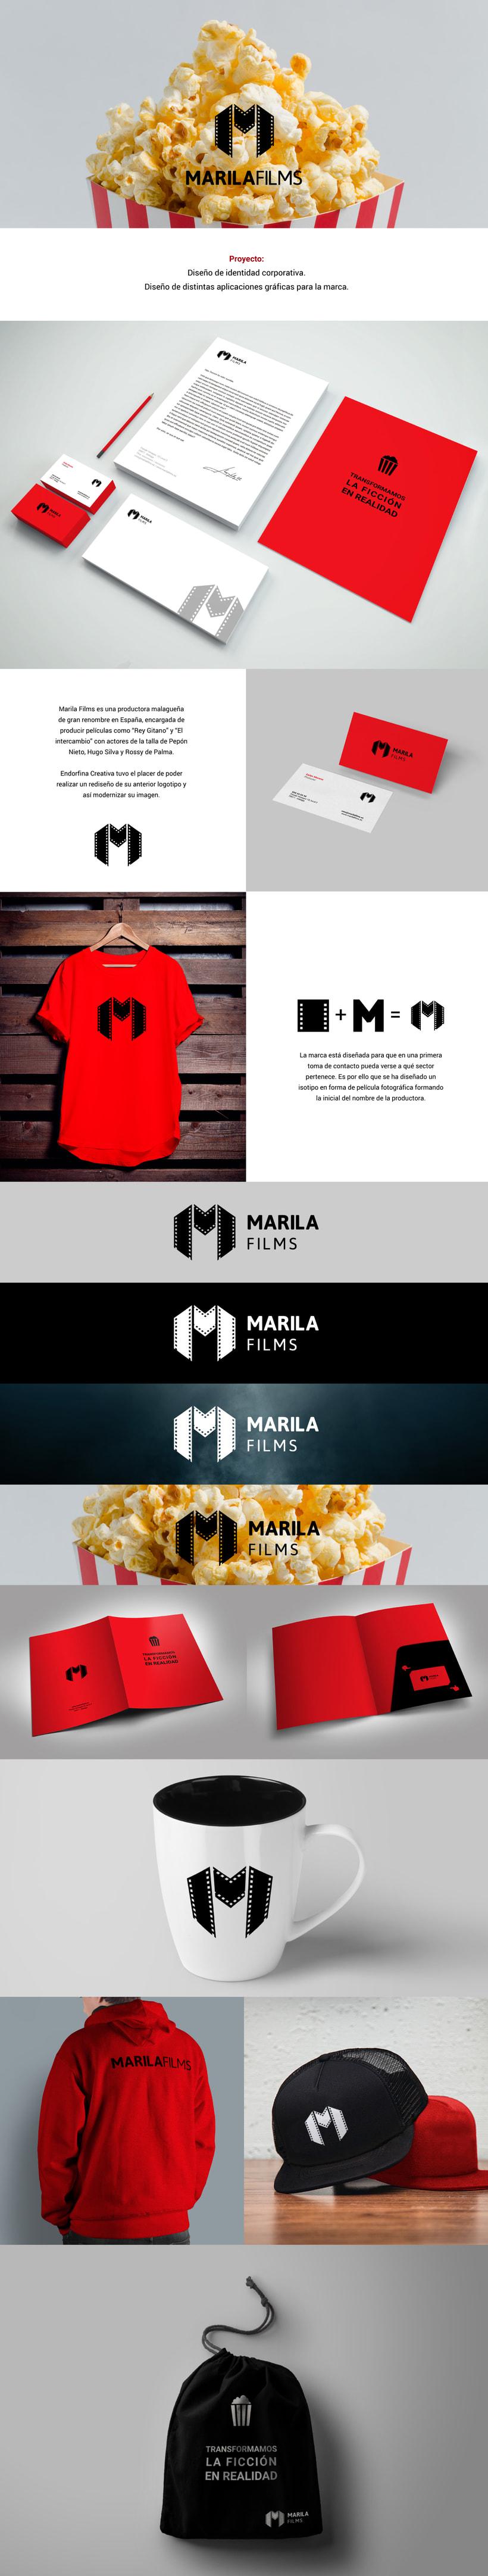 Identidad corporativa para MARILA FILMS 2